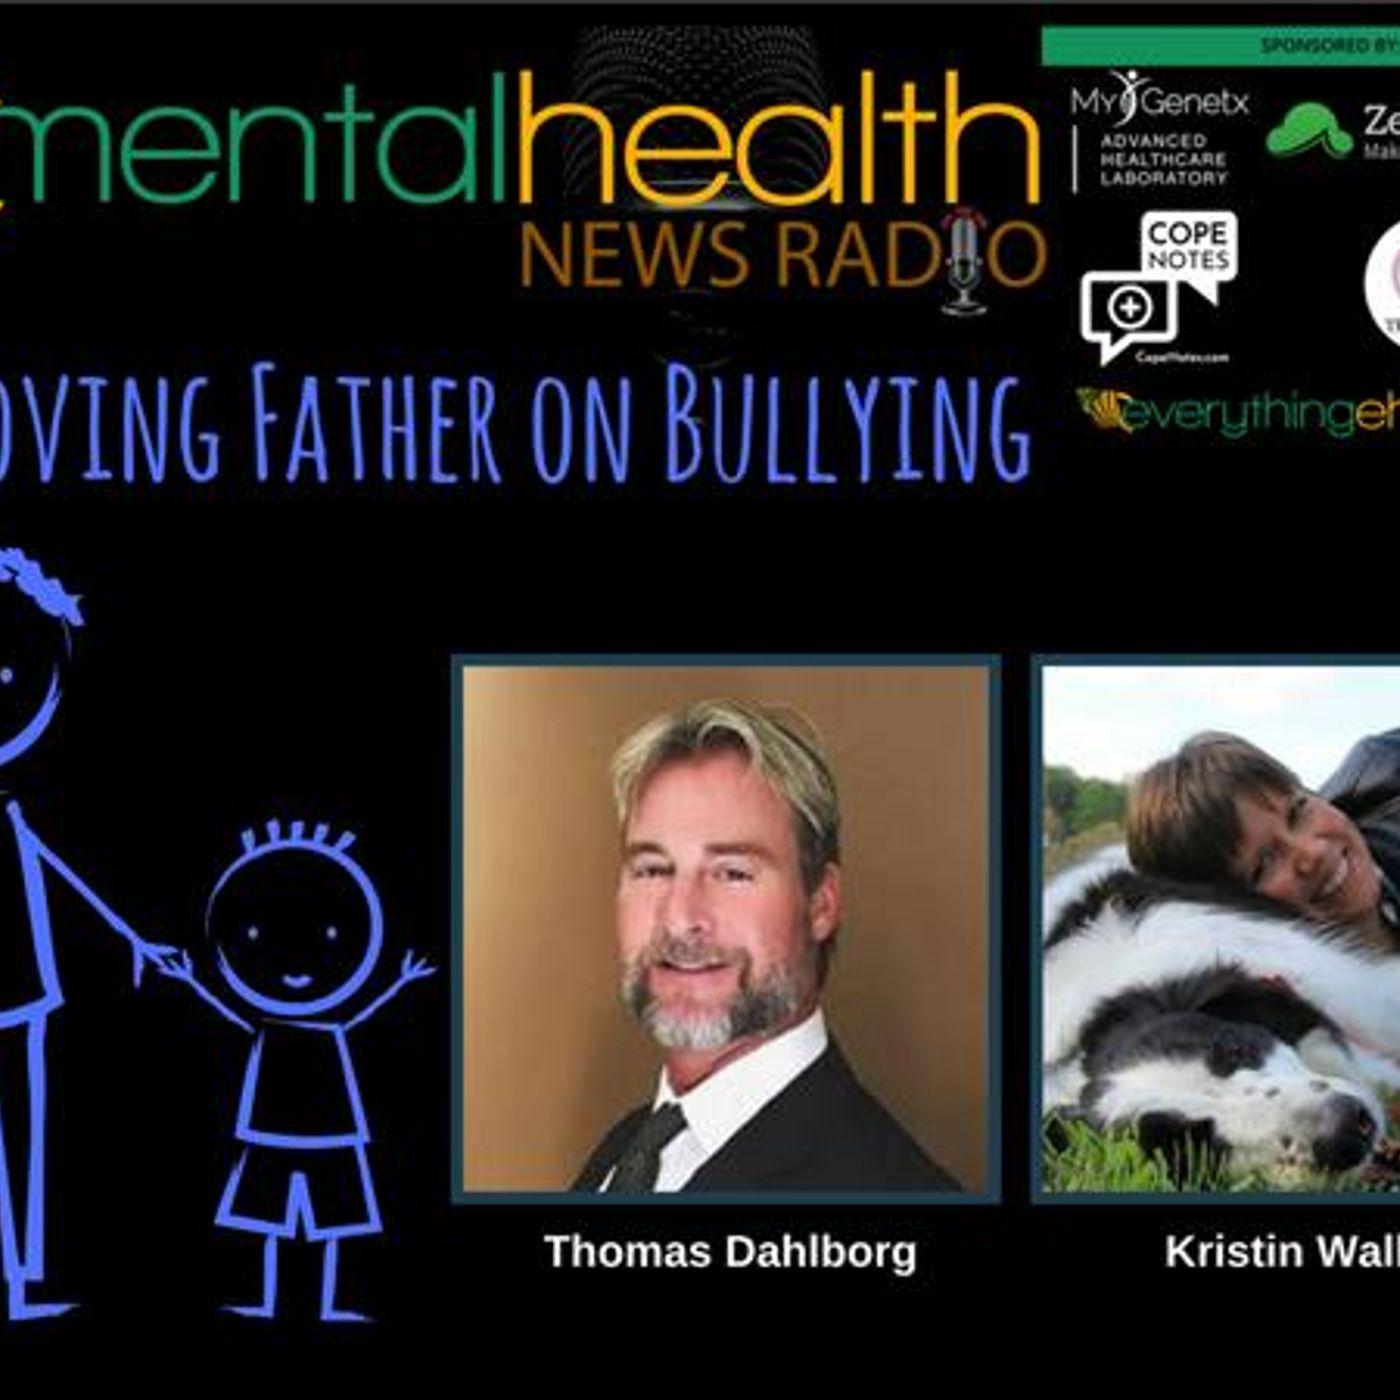 Mental Health News Radio - A Loving Father: Thomas Dahlborg on Bullying